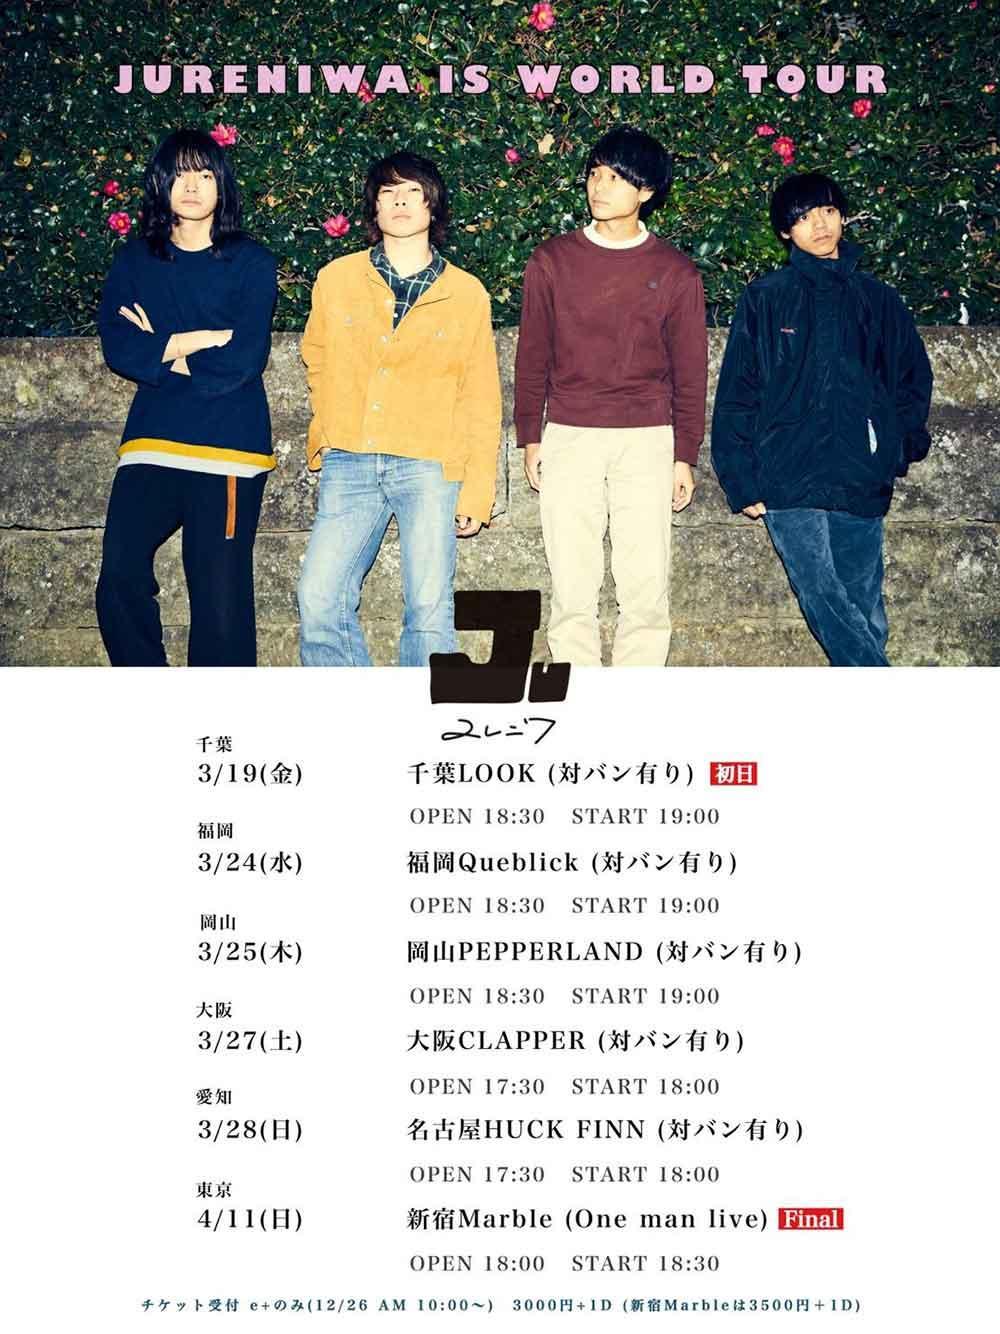 jureniwa_tour_kokuchi.jpg